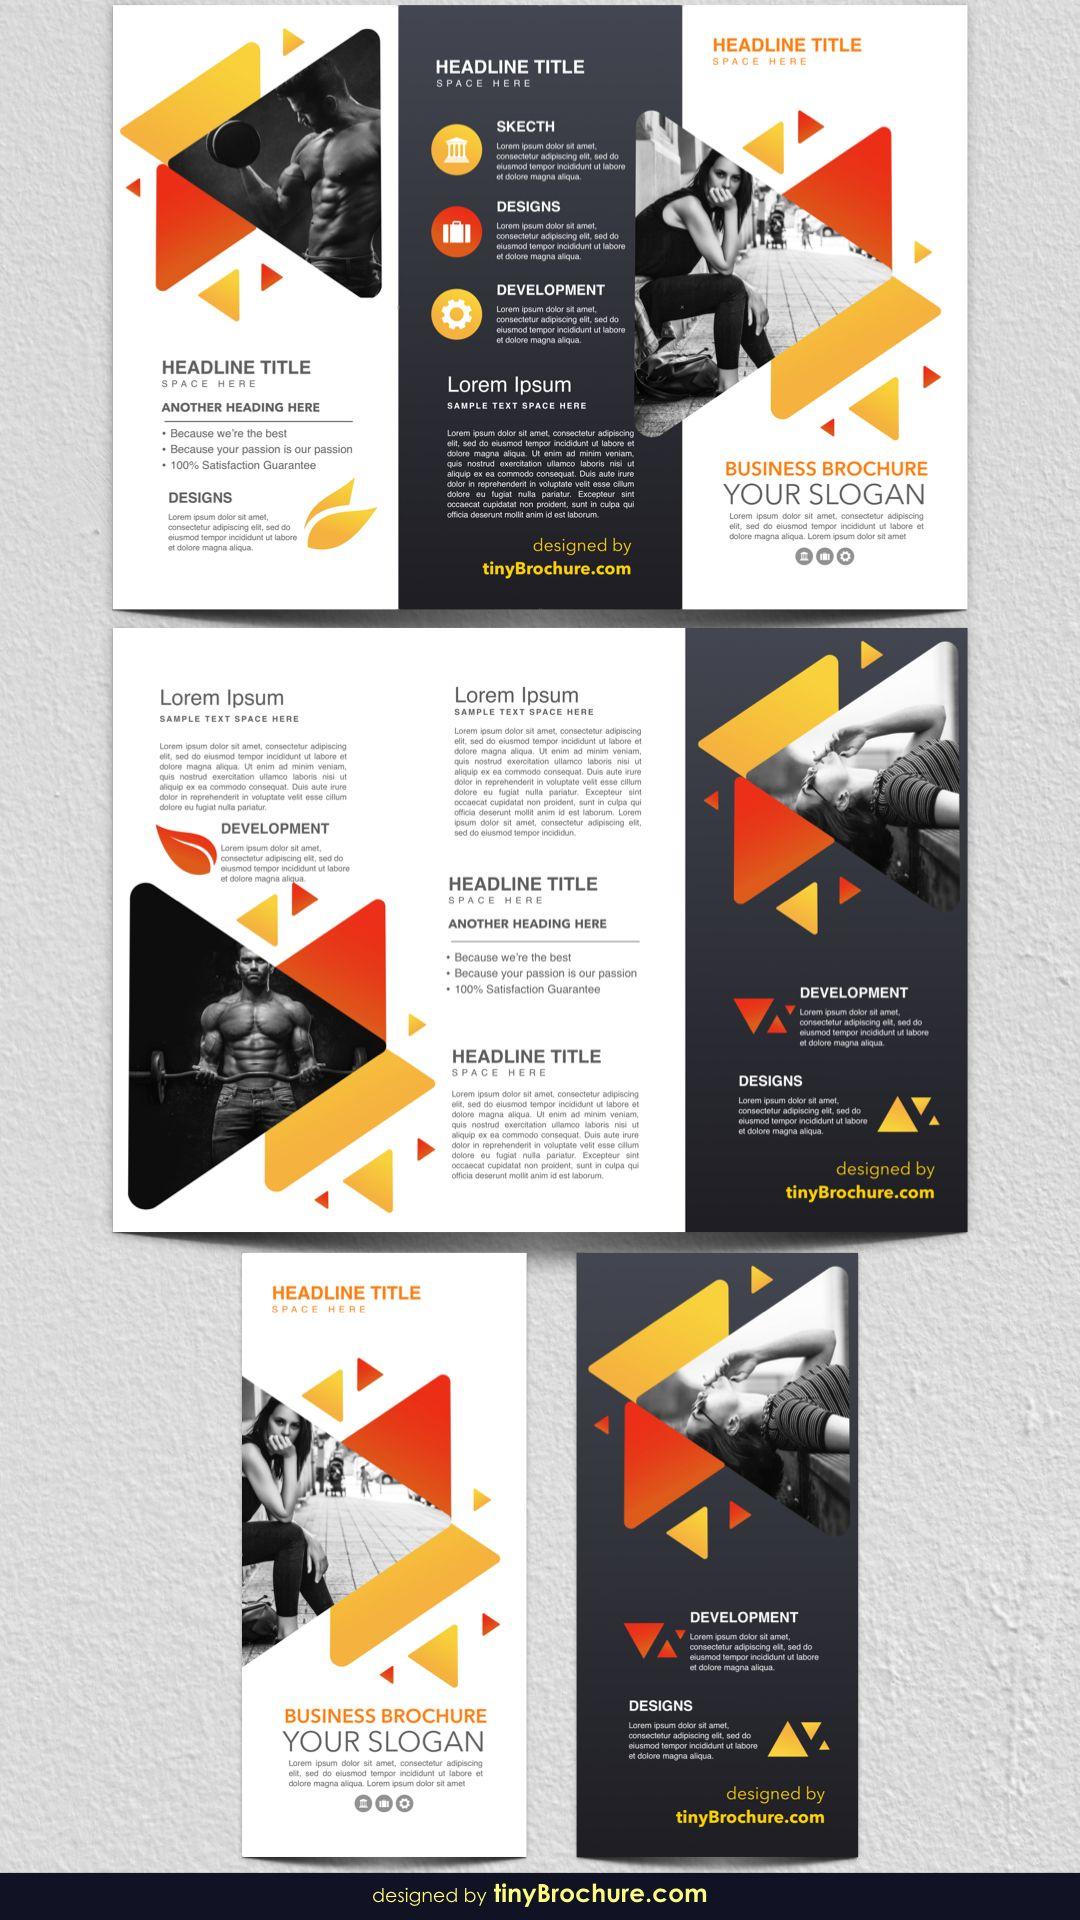 The Interesting 3 Panel Brochure Template Google Docs 2019 Graphic Design Regarding Brochure Design Template Brochure Design Layout Brochure Design Creative